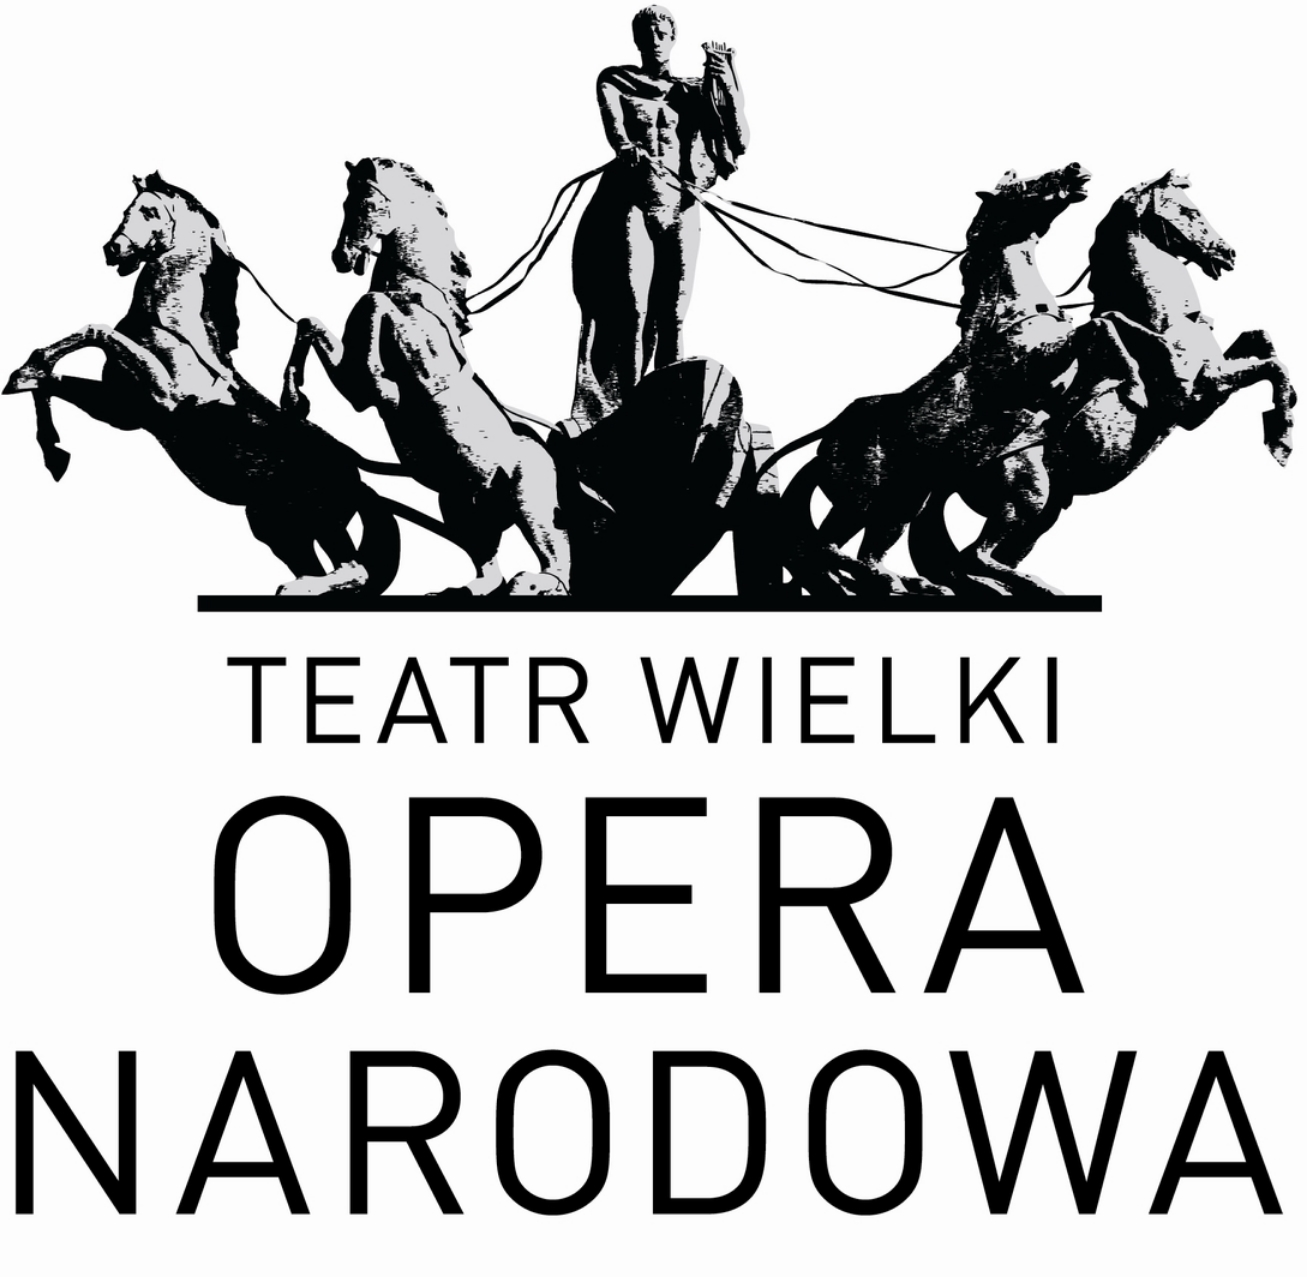 teatr-wielki-czarne_bez-_tl.jpg